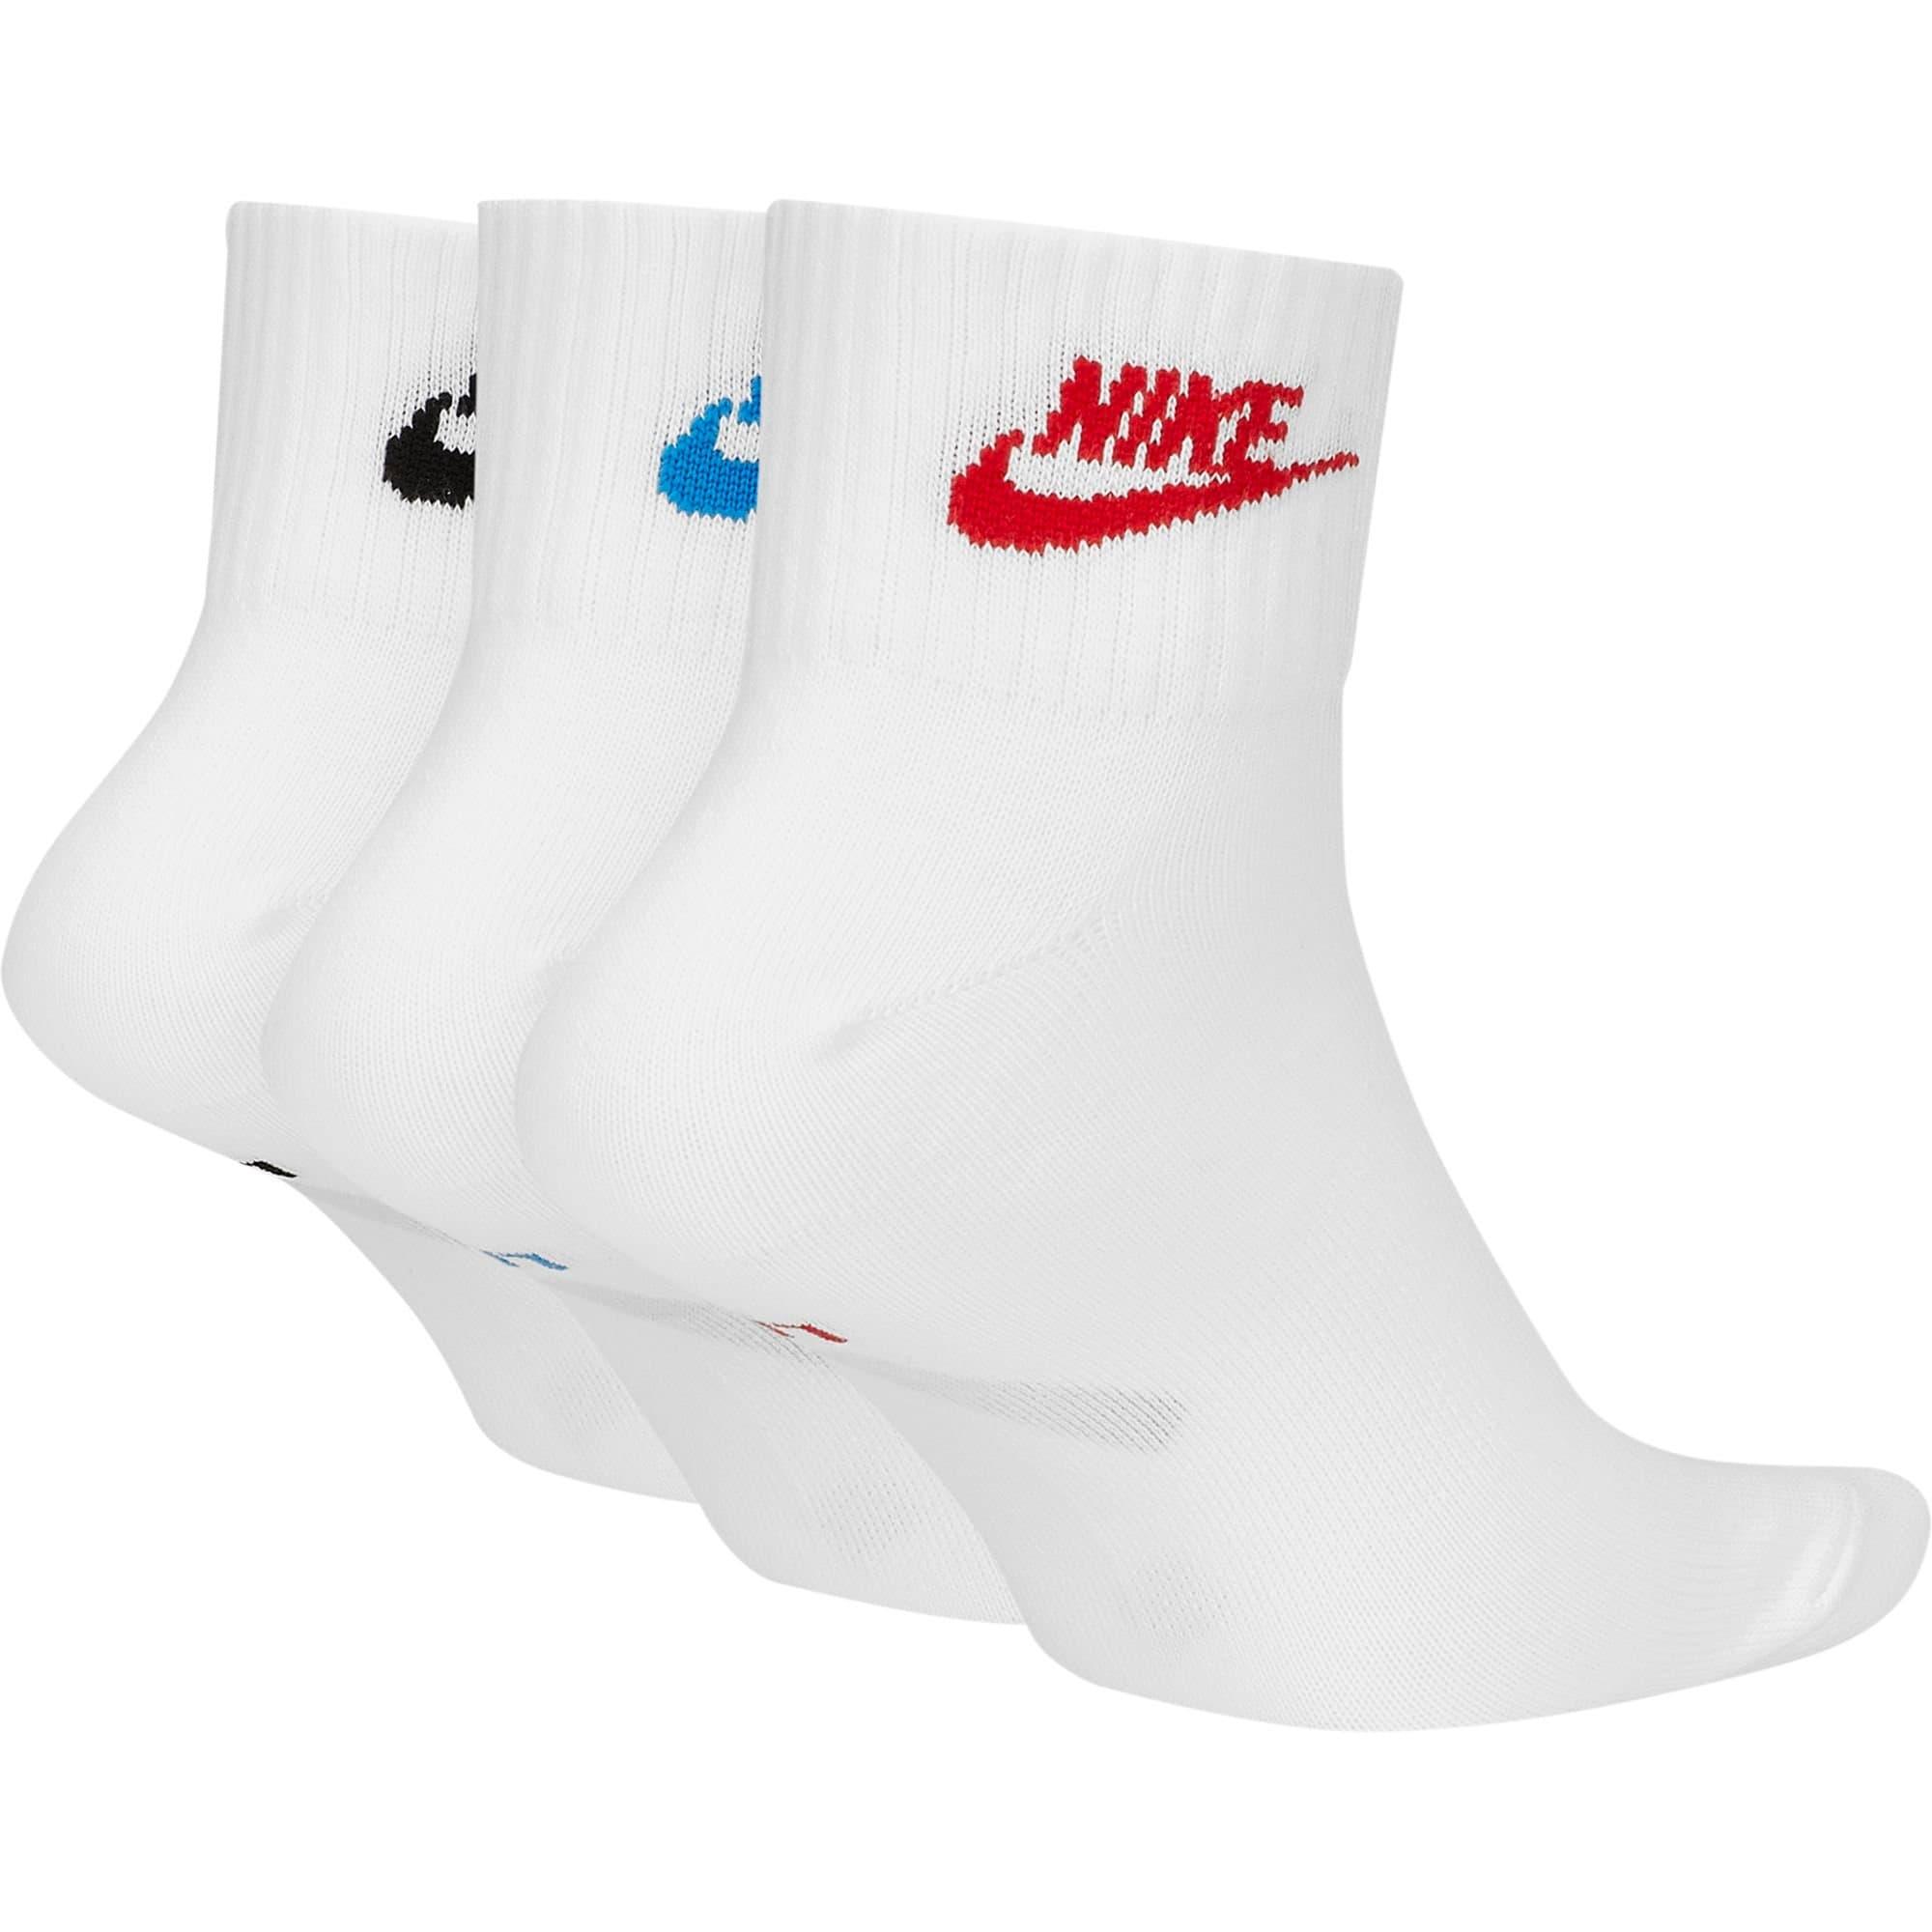 Everyday Essential Ankle 3 Çift Beyaz Çorap (SK0110-911)